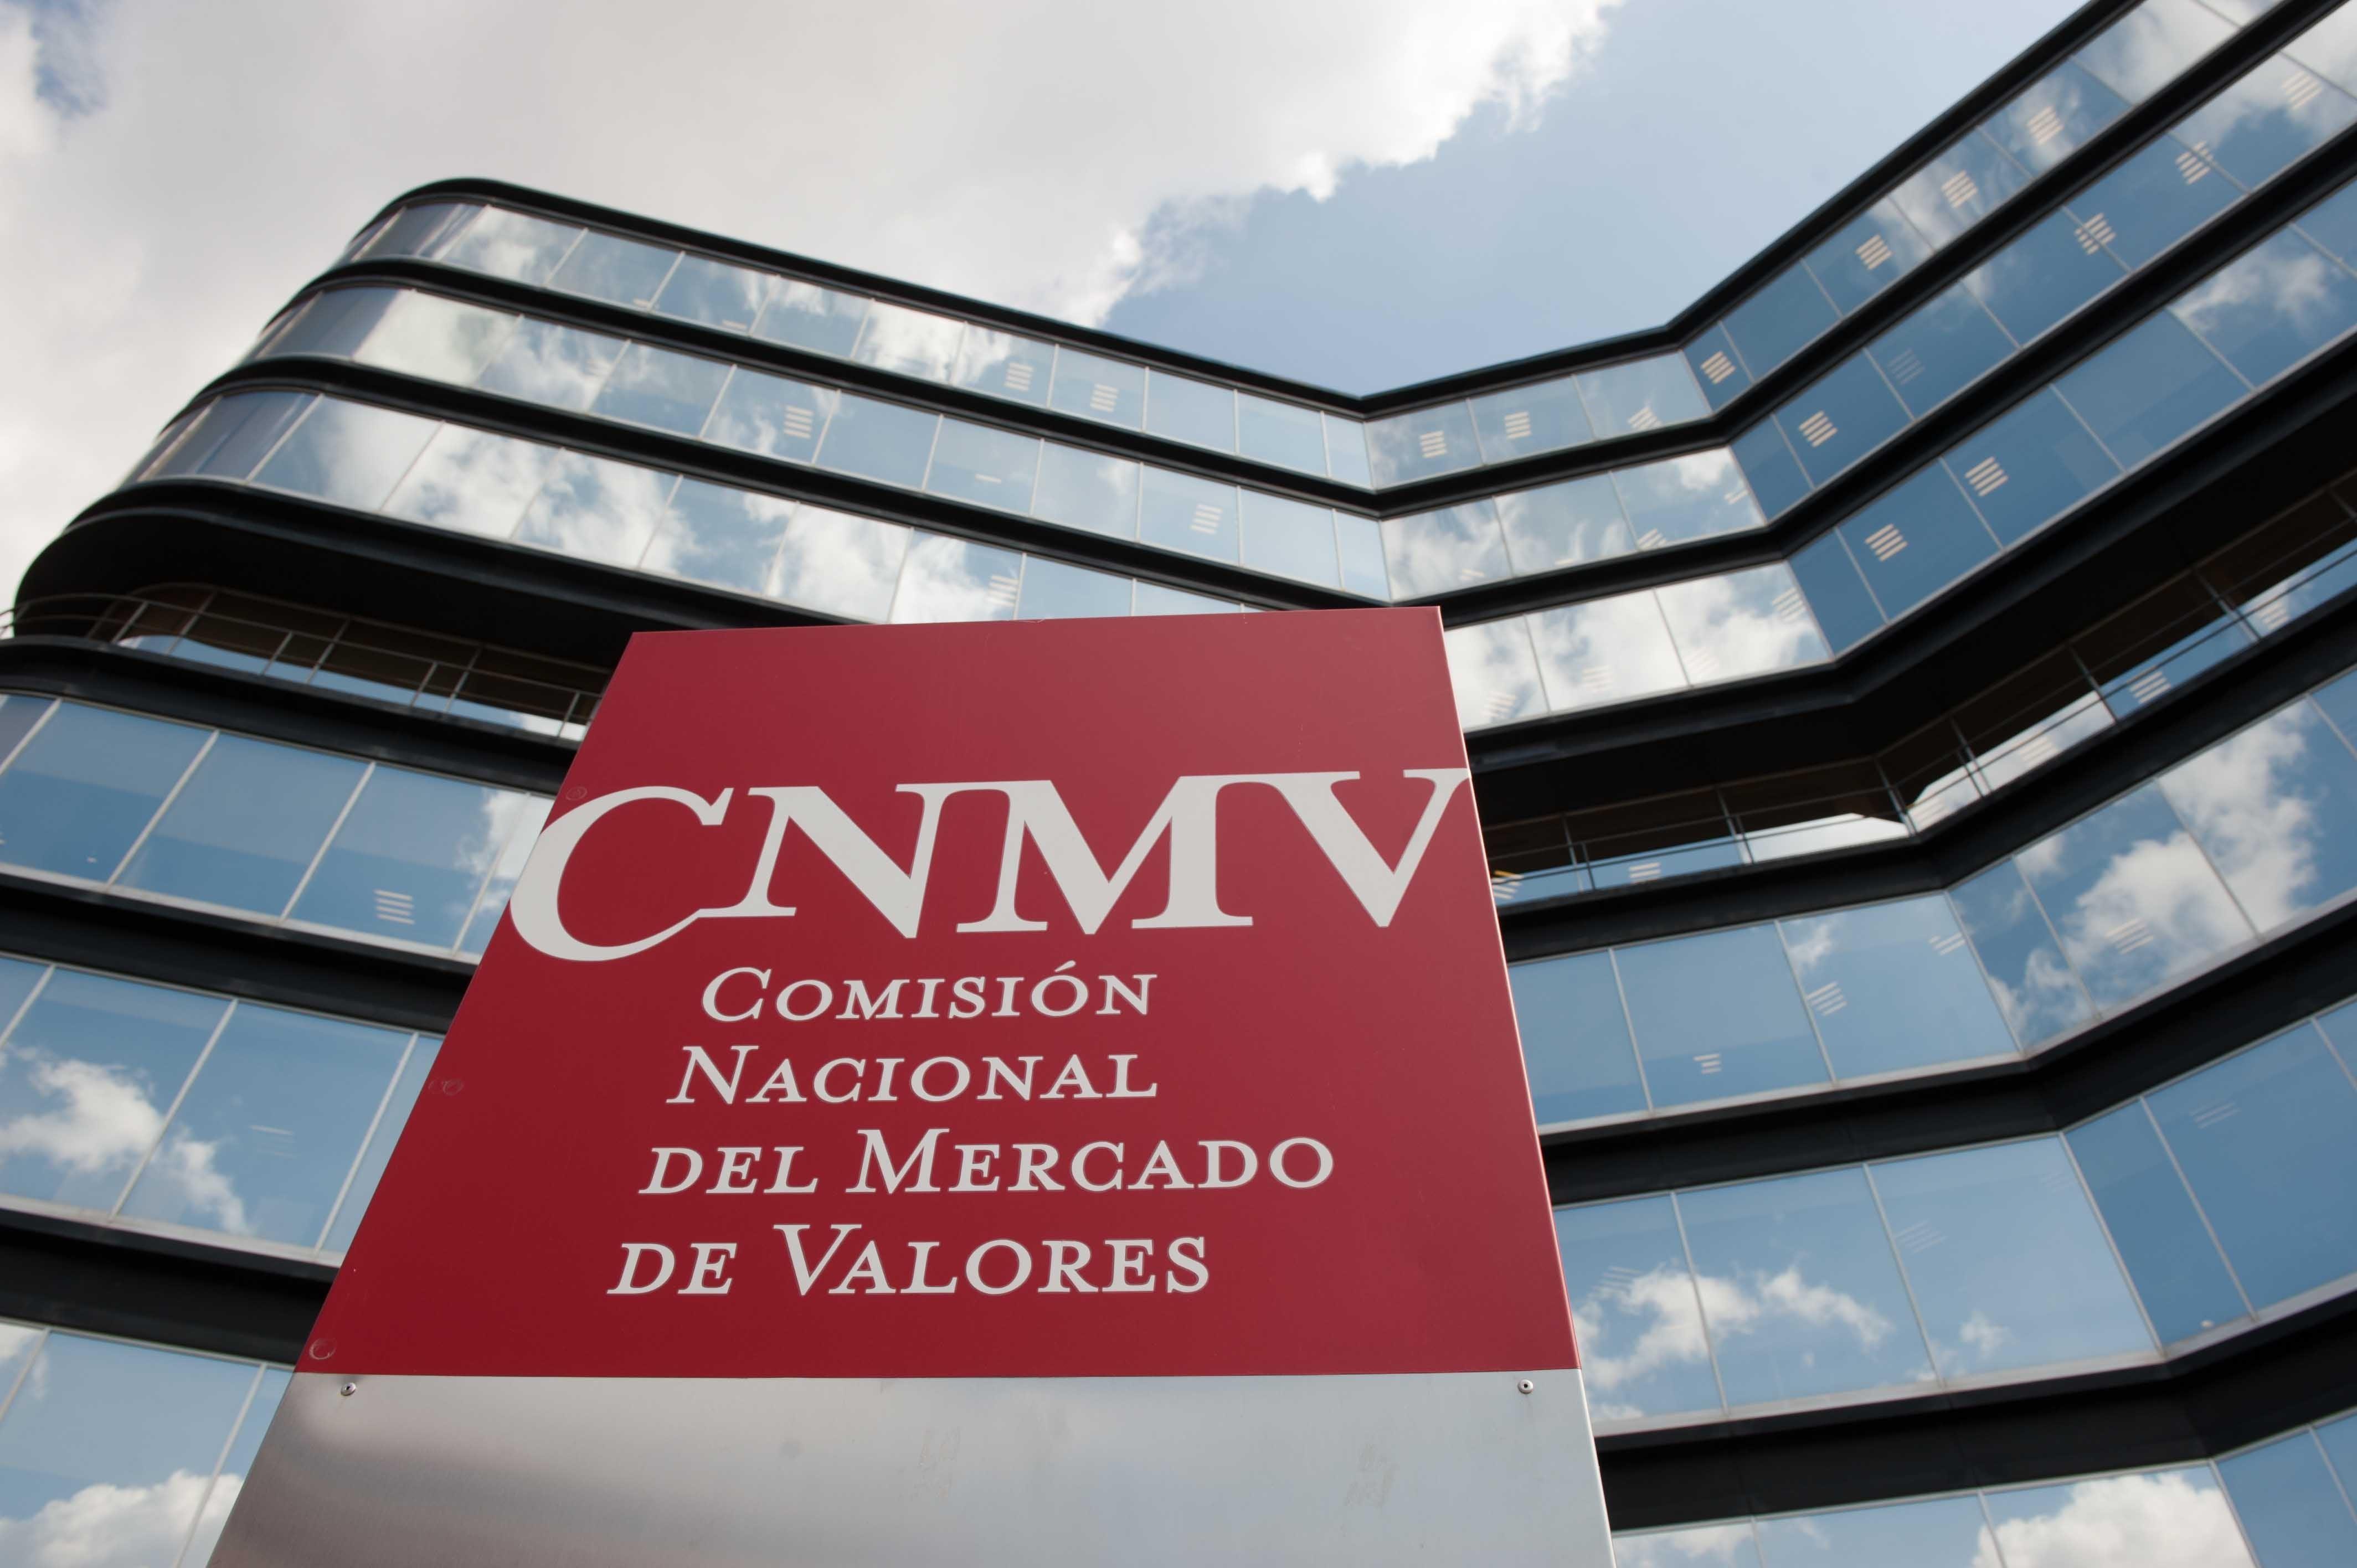 CNMV Comisión Nacional del Mercado de Valores